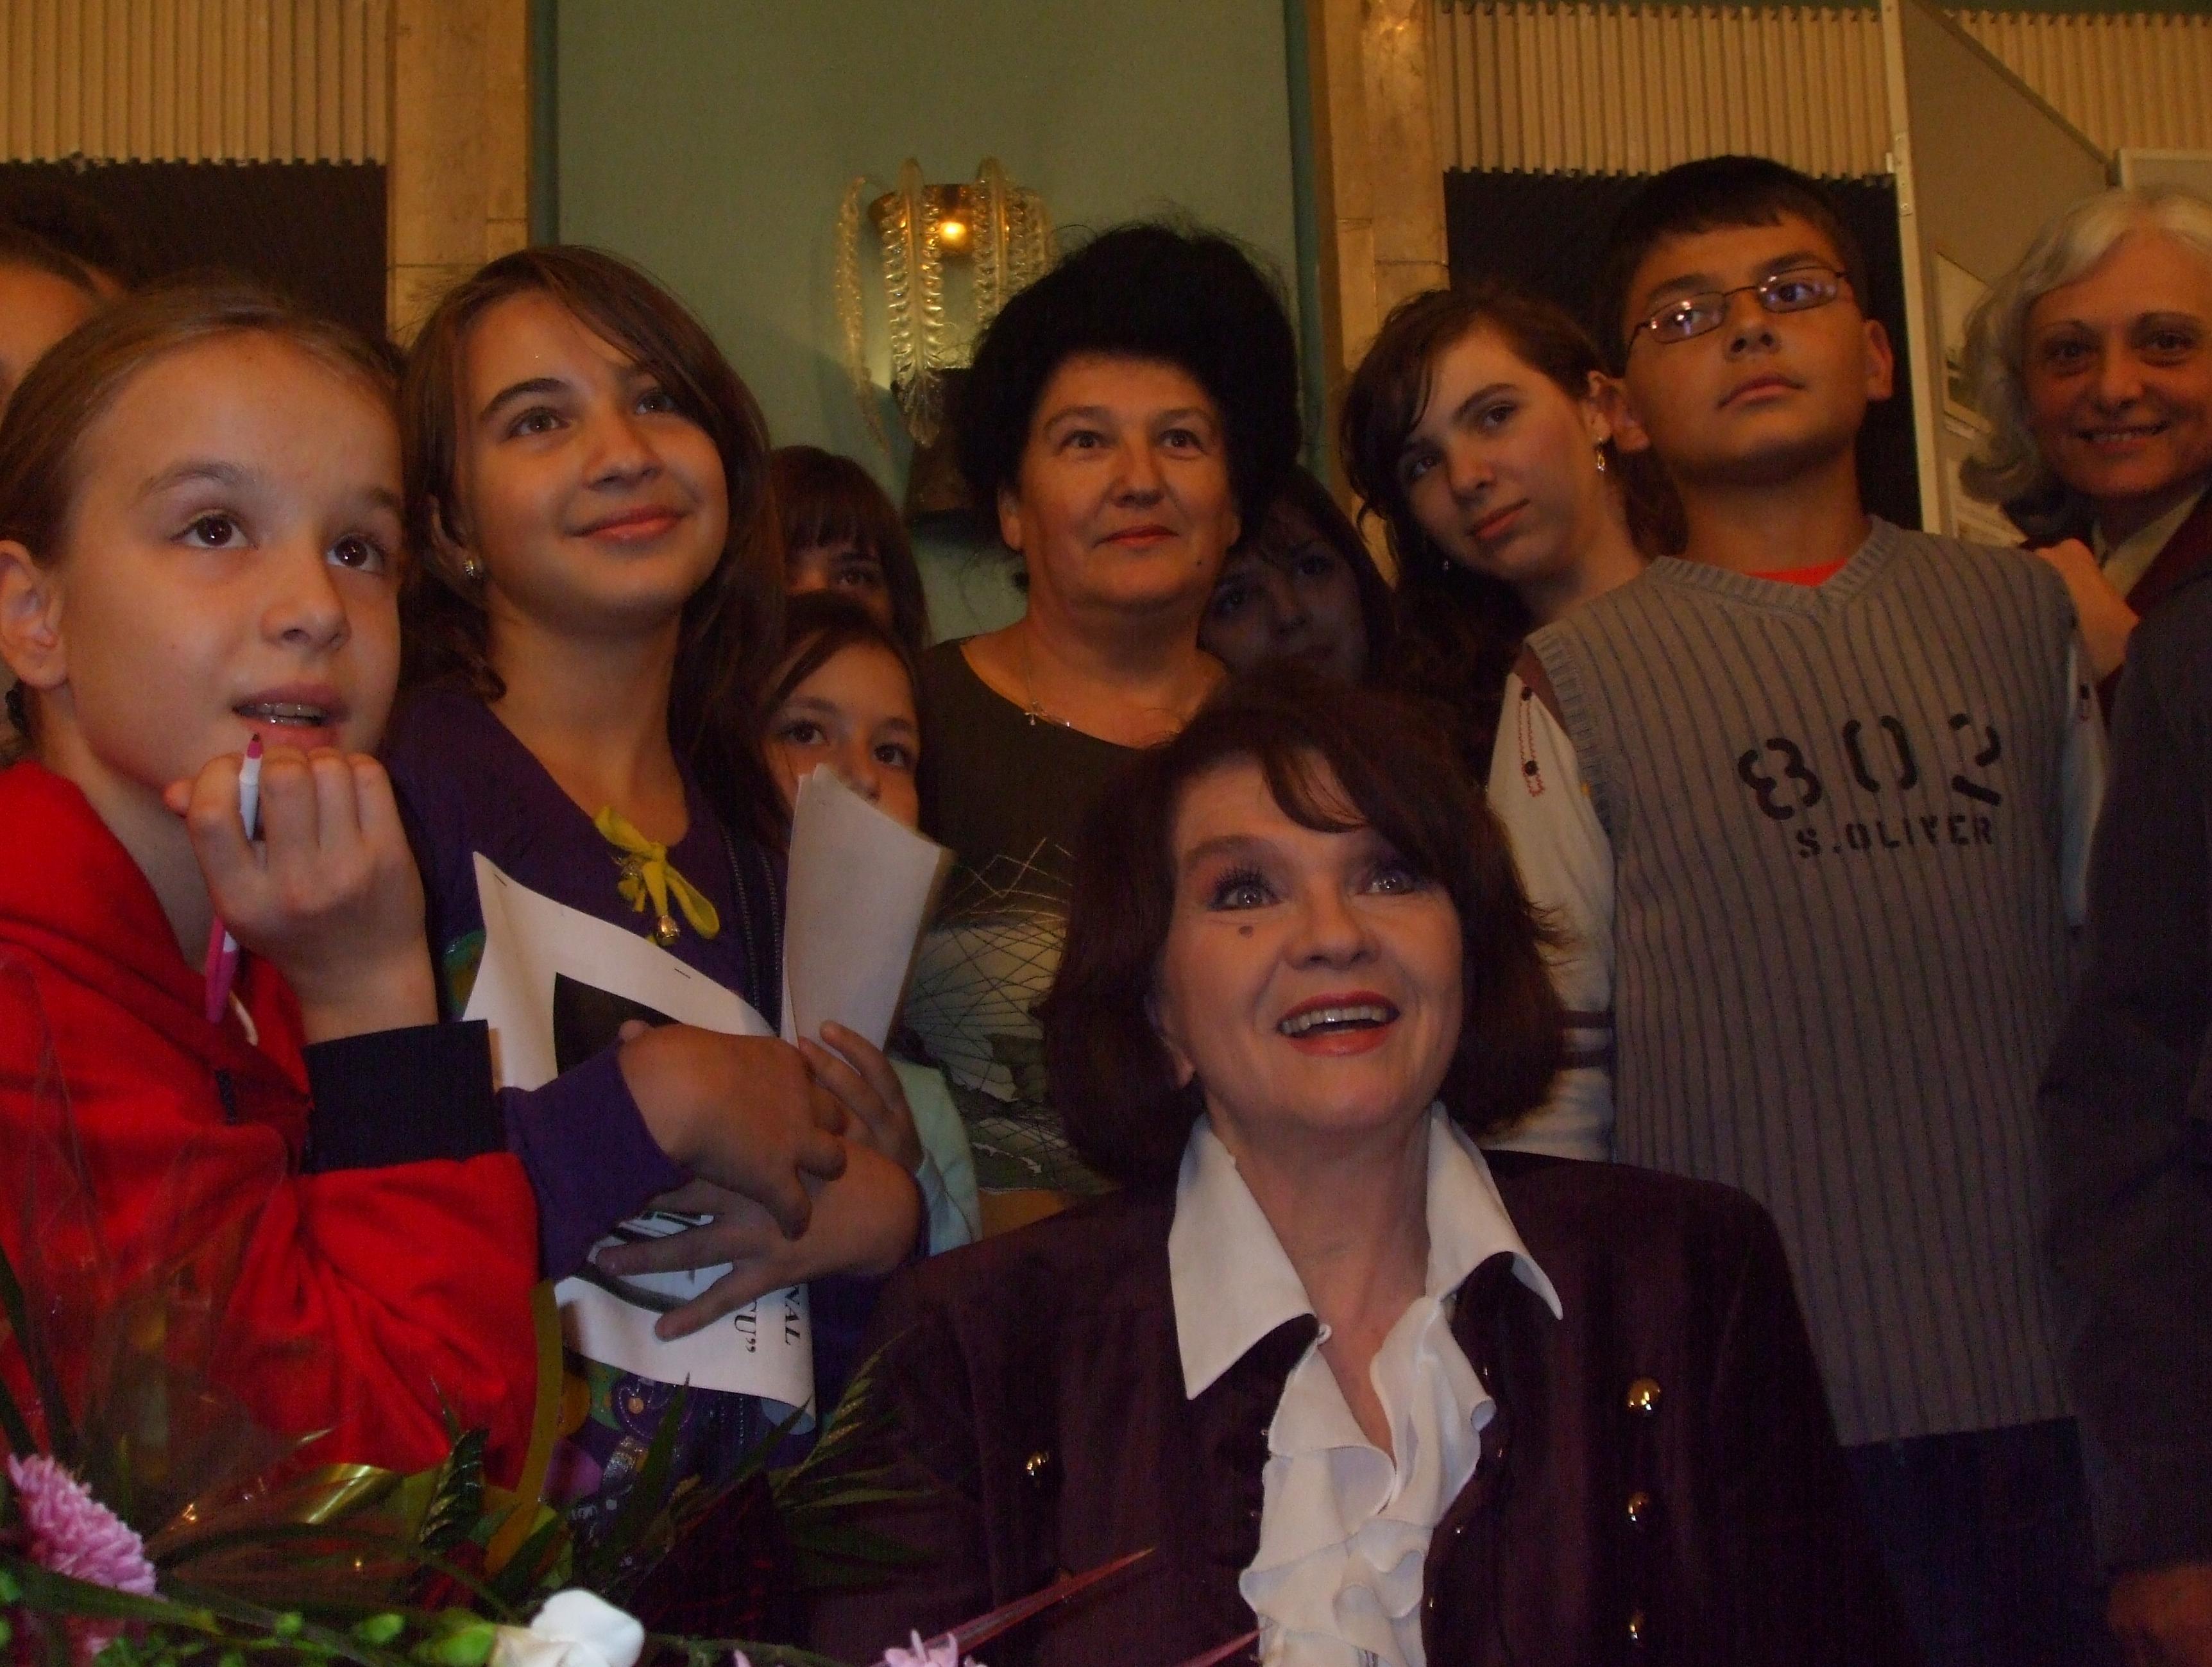 Alina radu from bucharest - 2 4